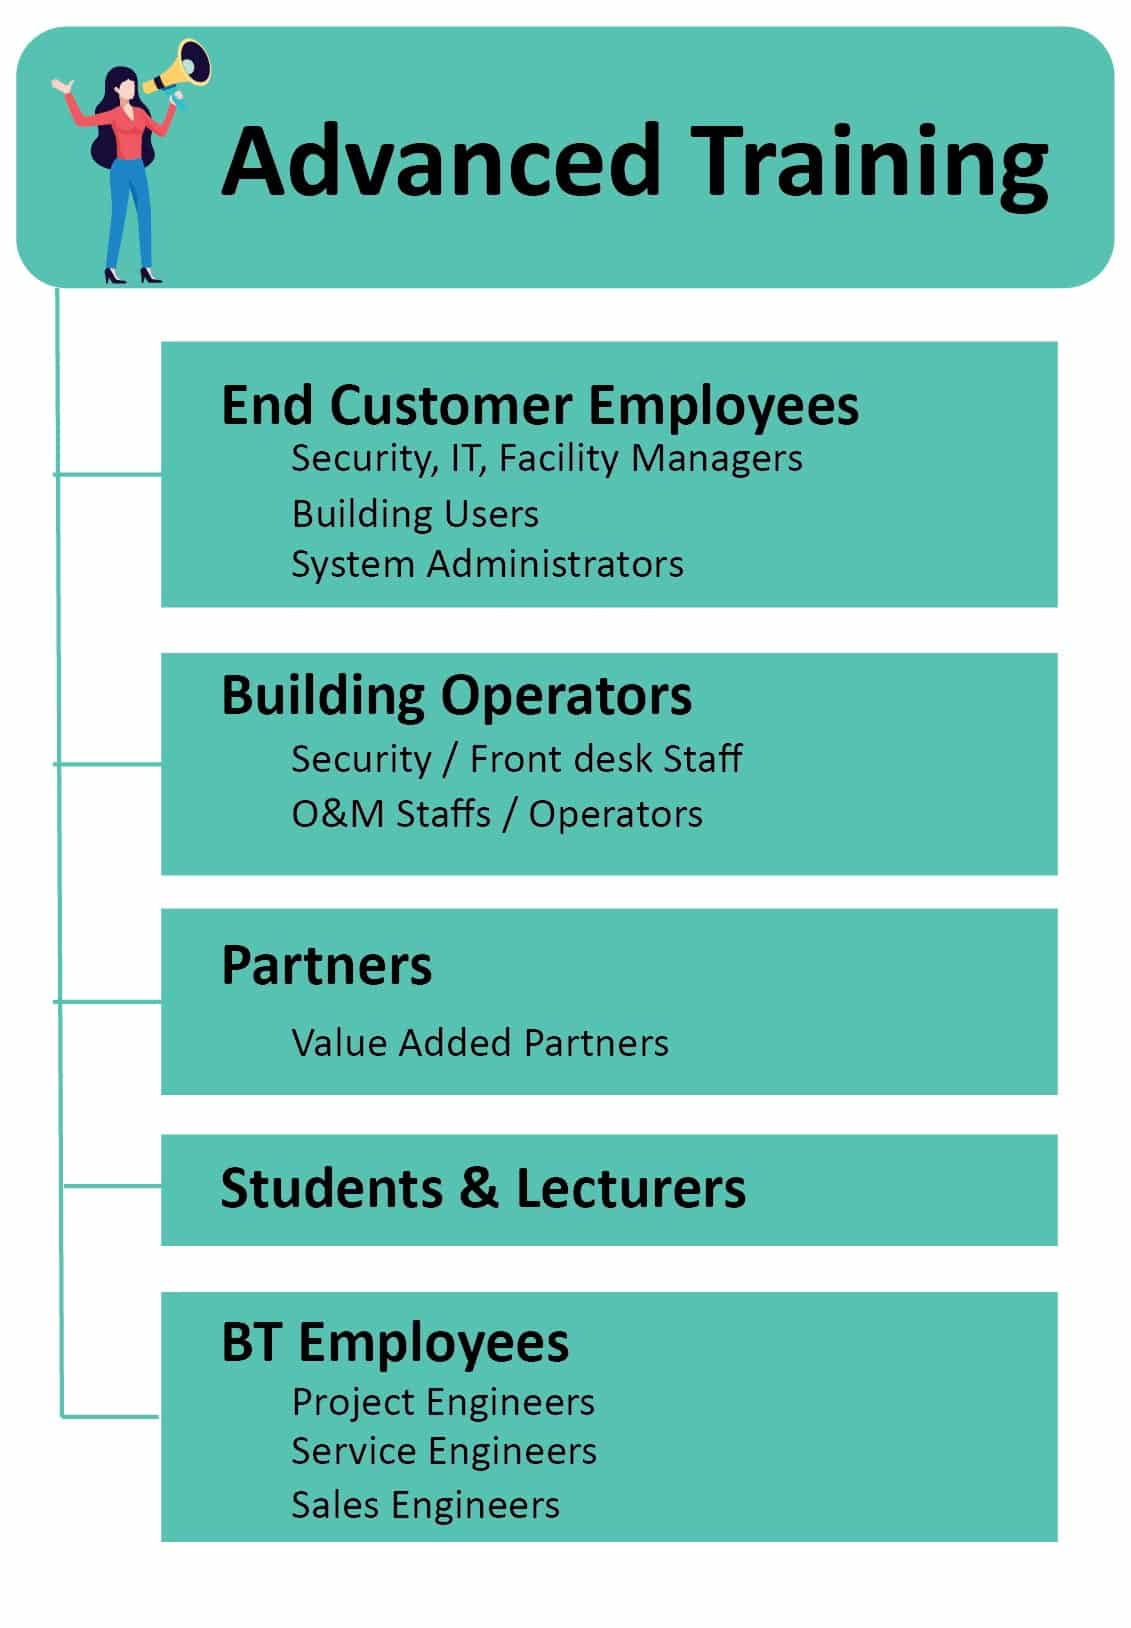 MEP HVAC Advanced Training for Students|Jobseekers in Adilabad Telangana|SMEClabs